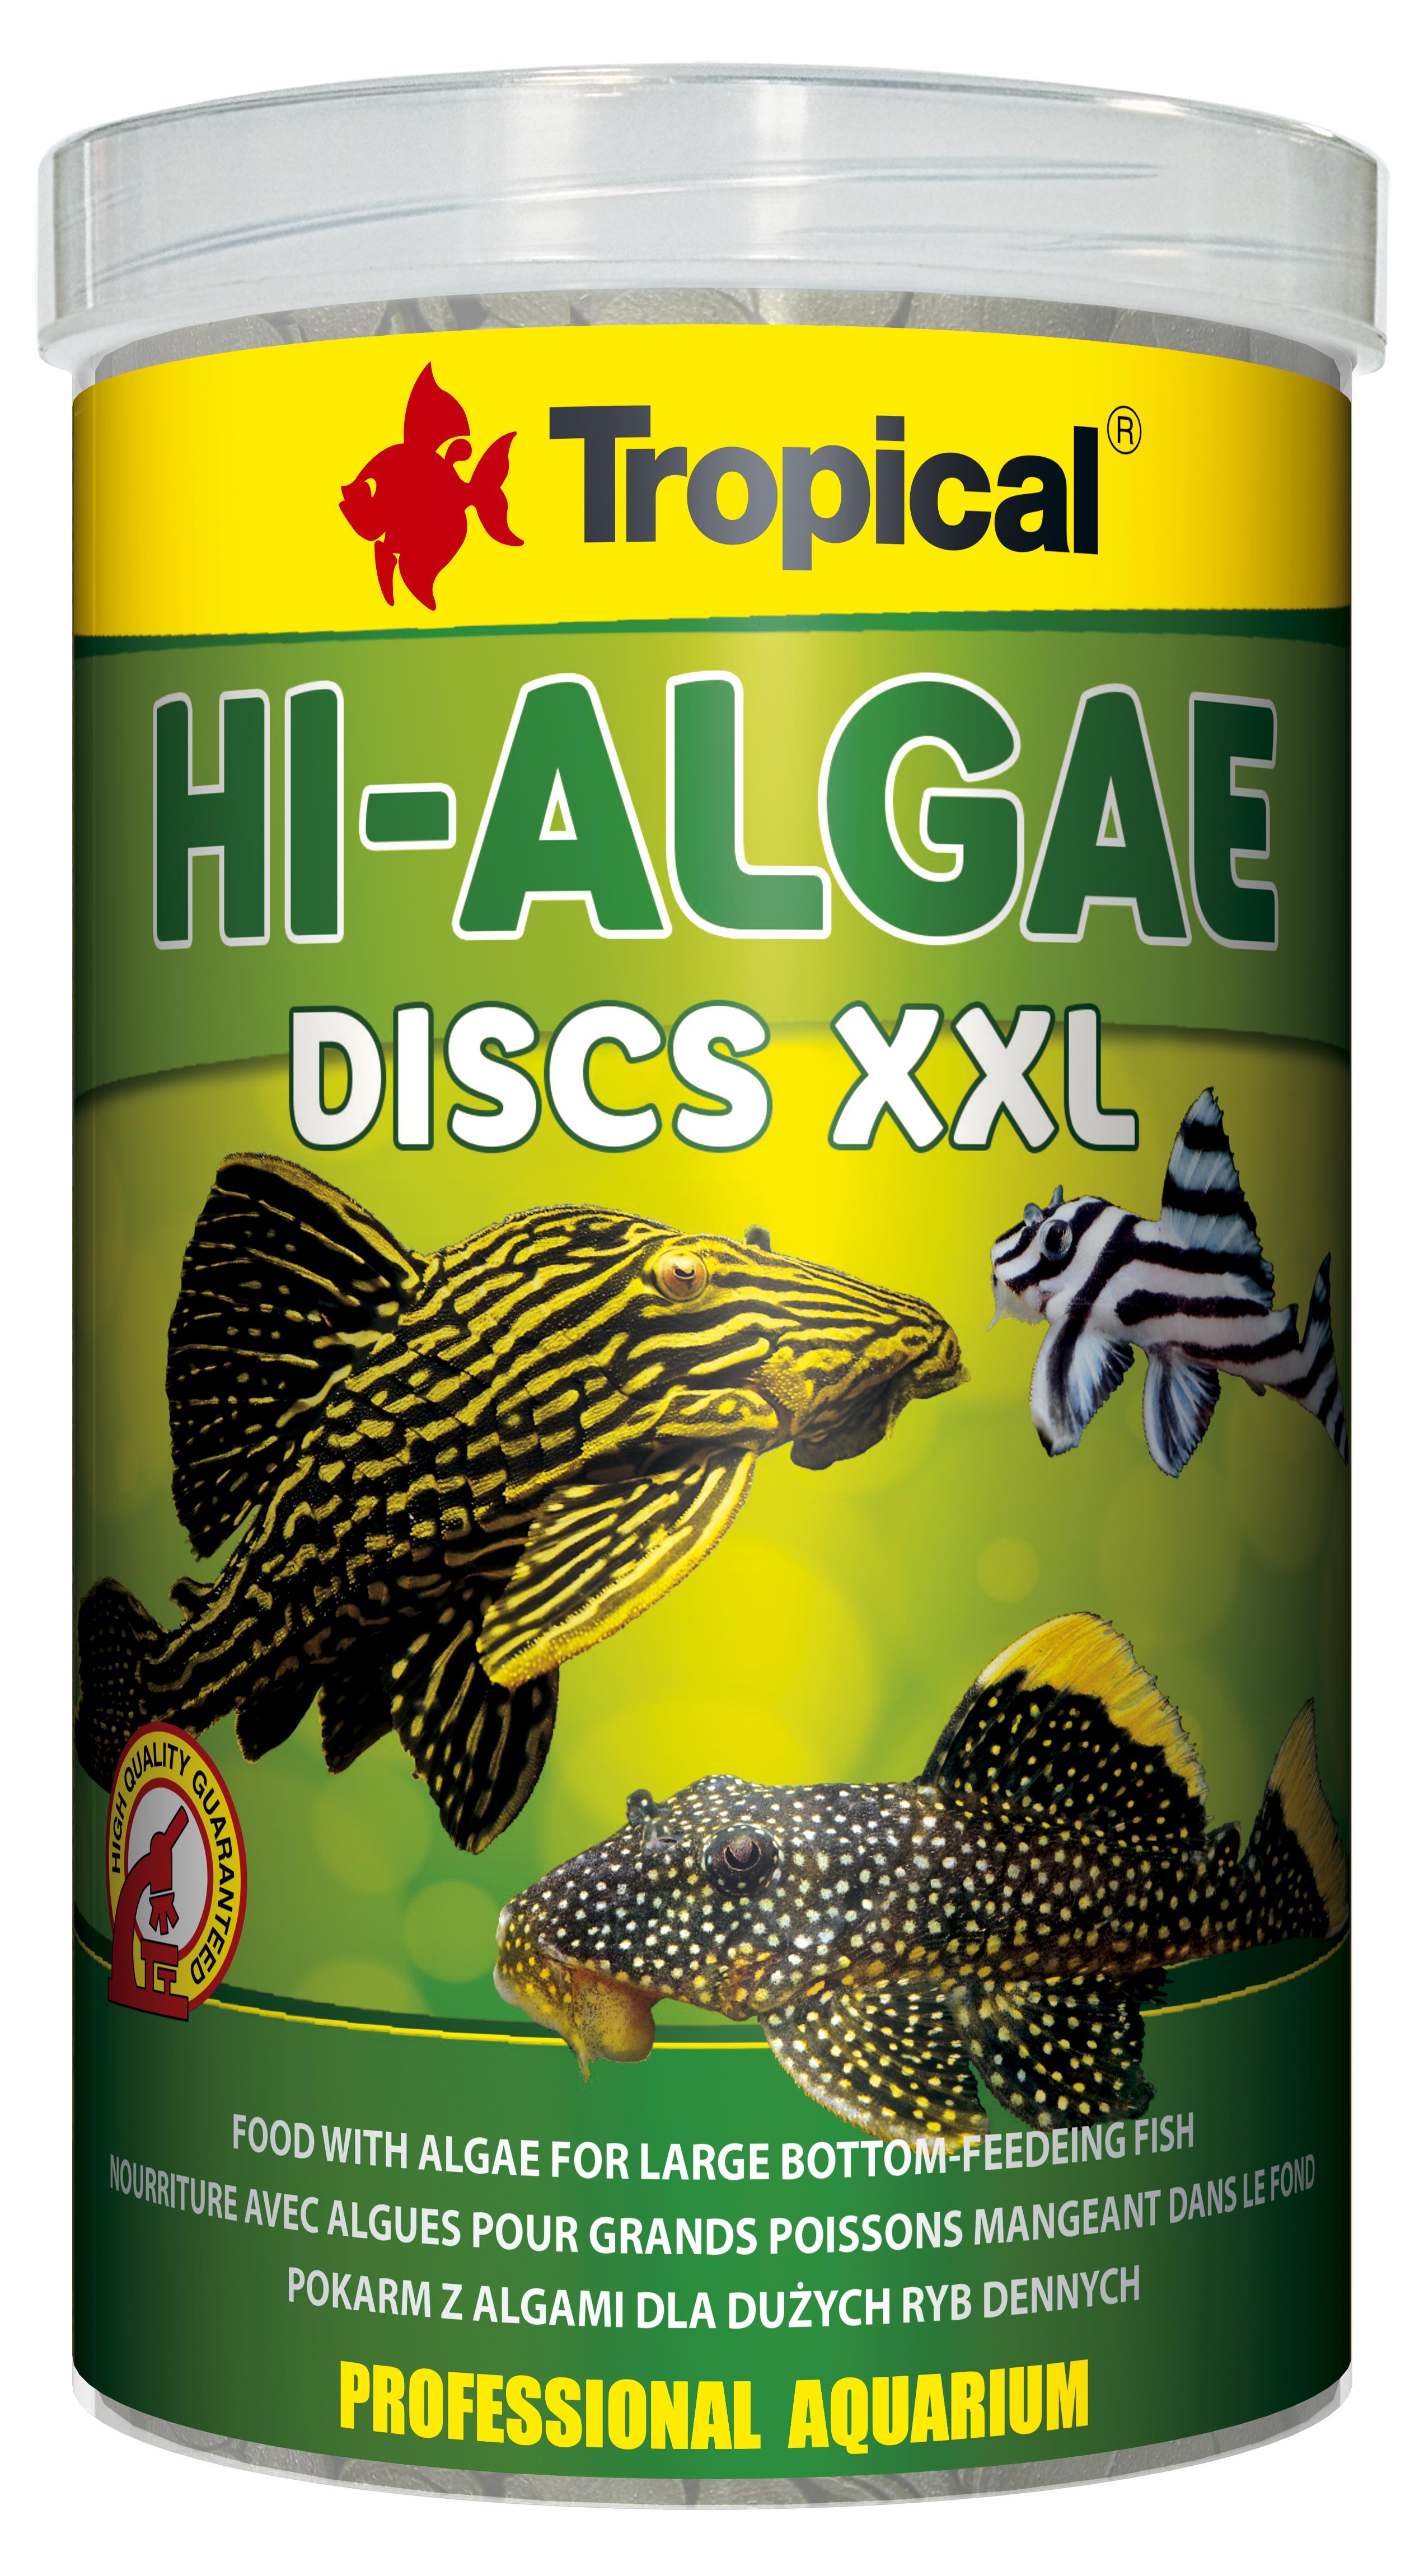 Tropical Hi-Algae Discs XXL - 1000ml/500g